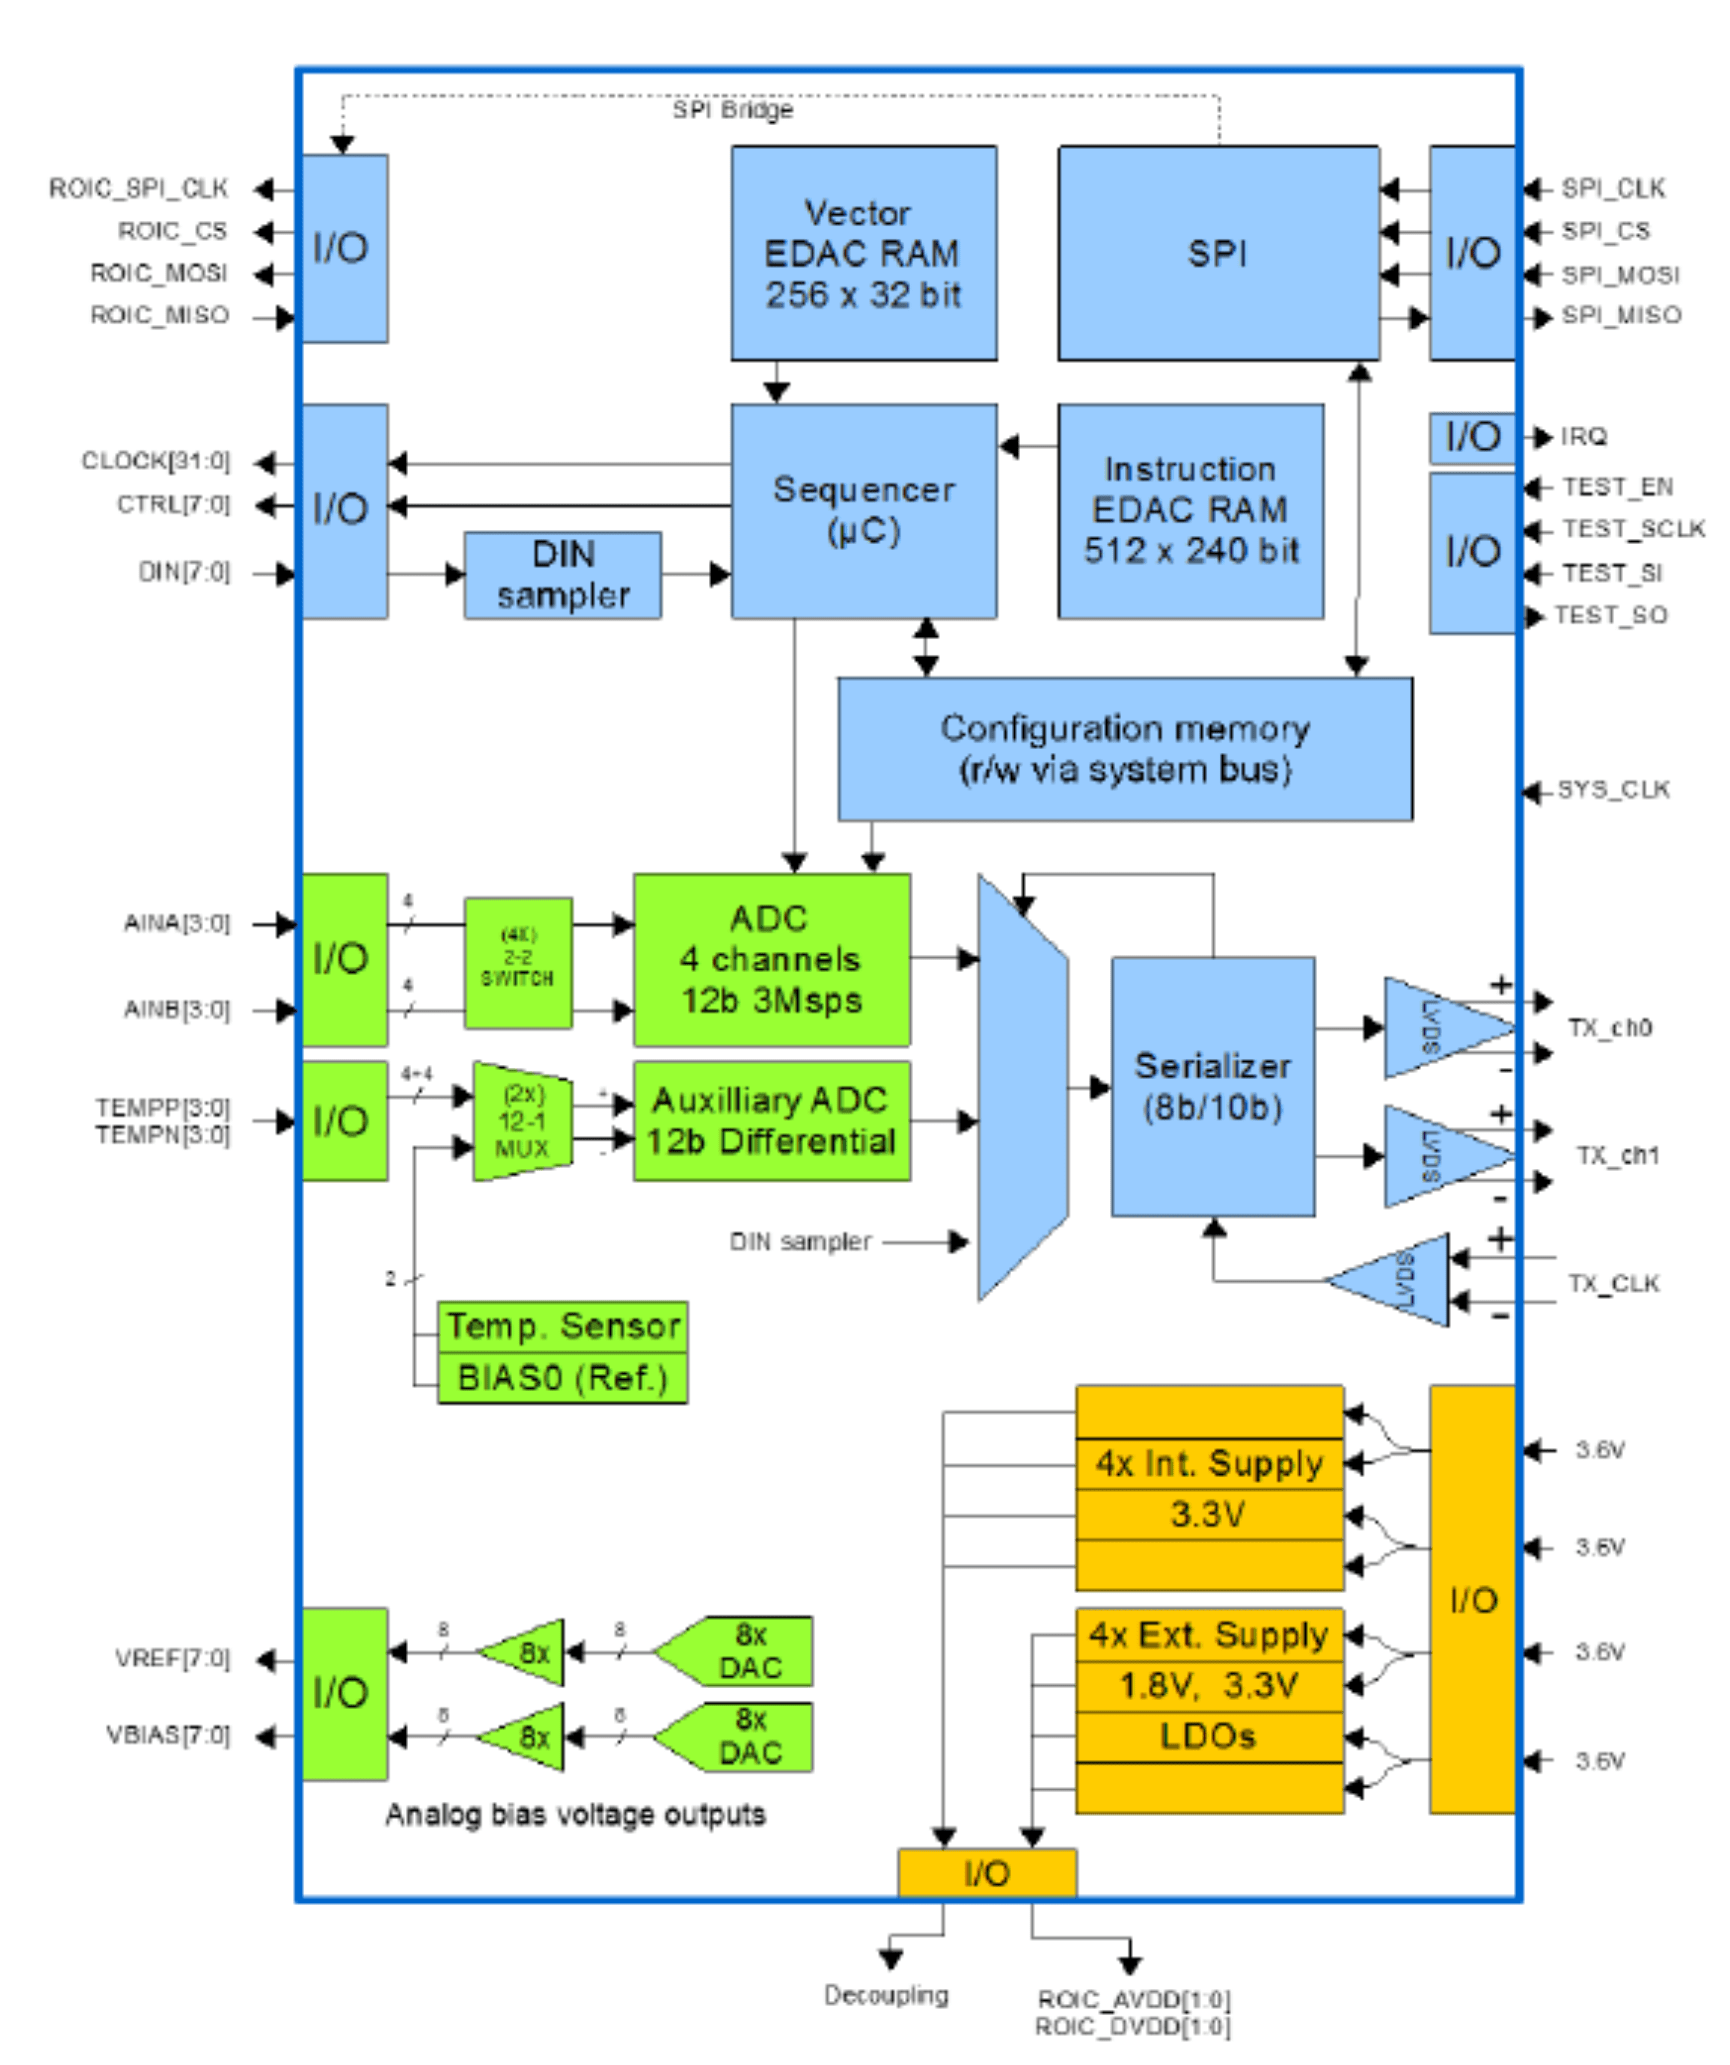 hight resolution of asic block diagram 742 63 kb